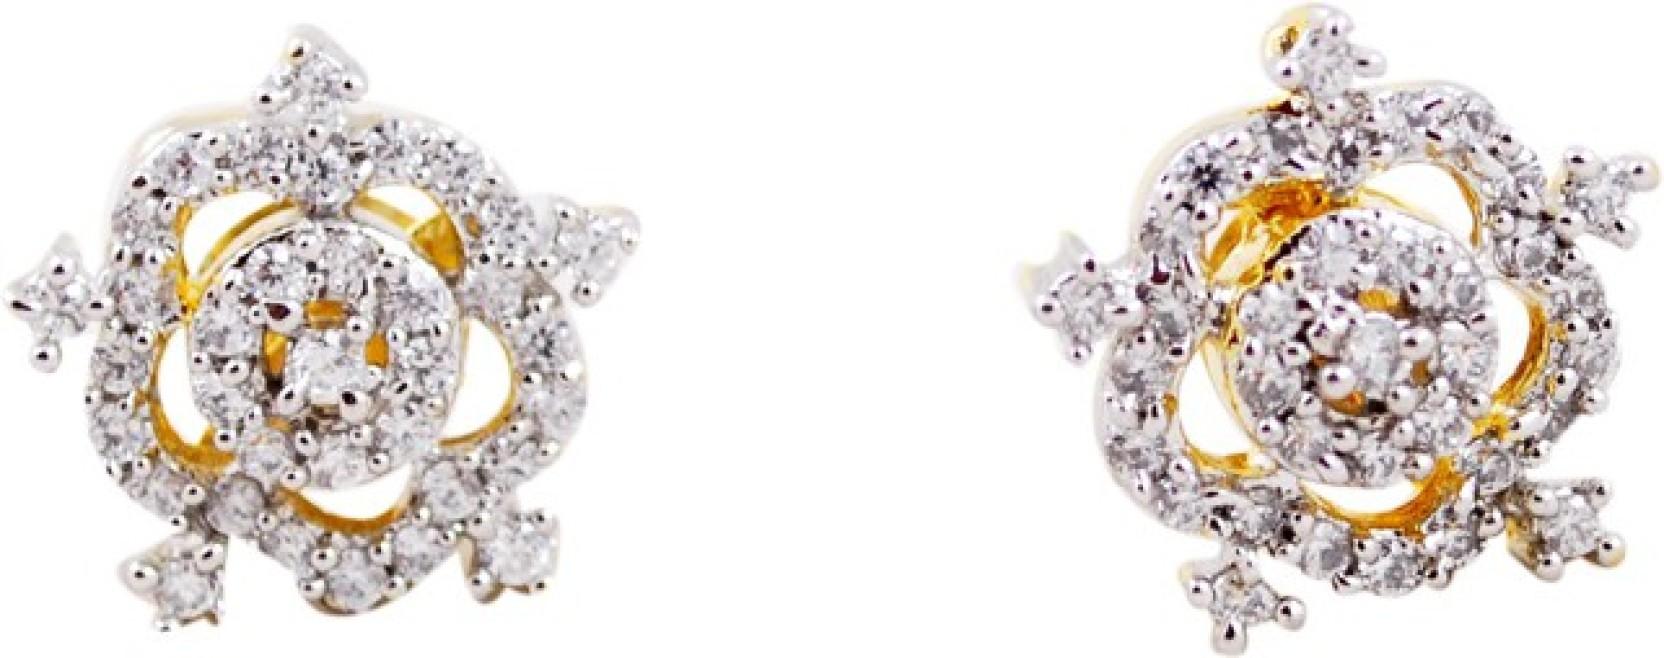 855e8dbad6560 Flipkart.com - Buy Nysa Gold & Silver Crystal Stone Copper Stud ...